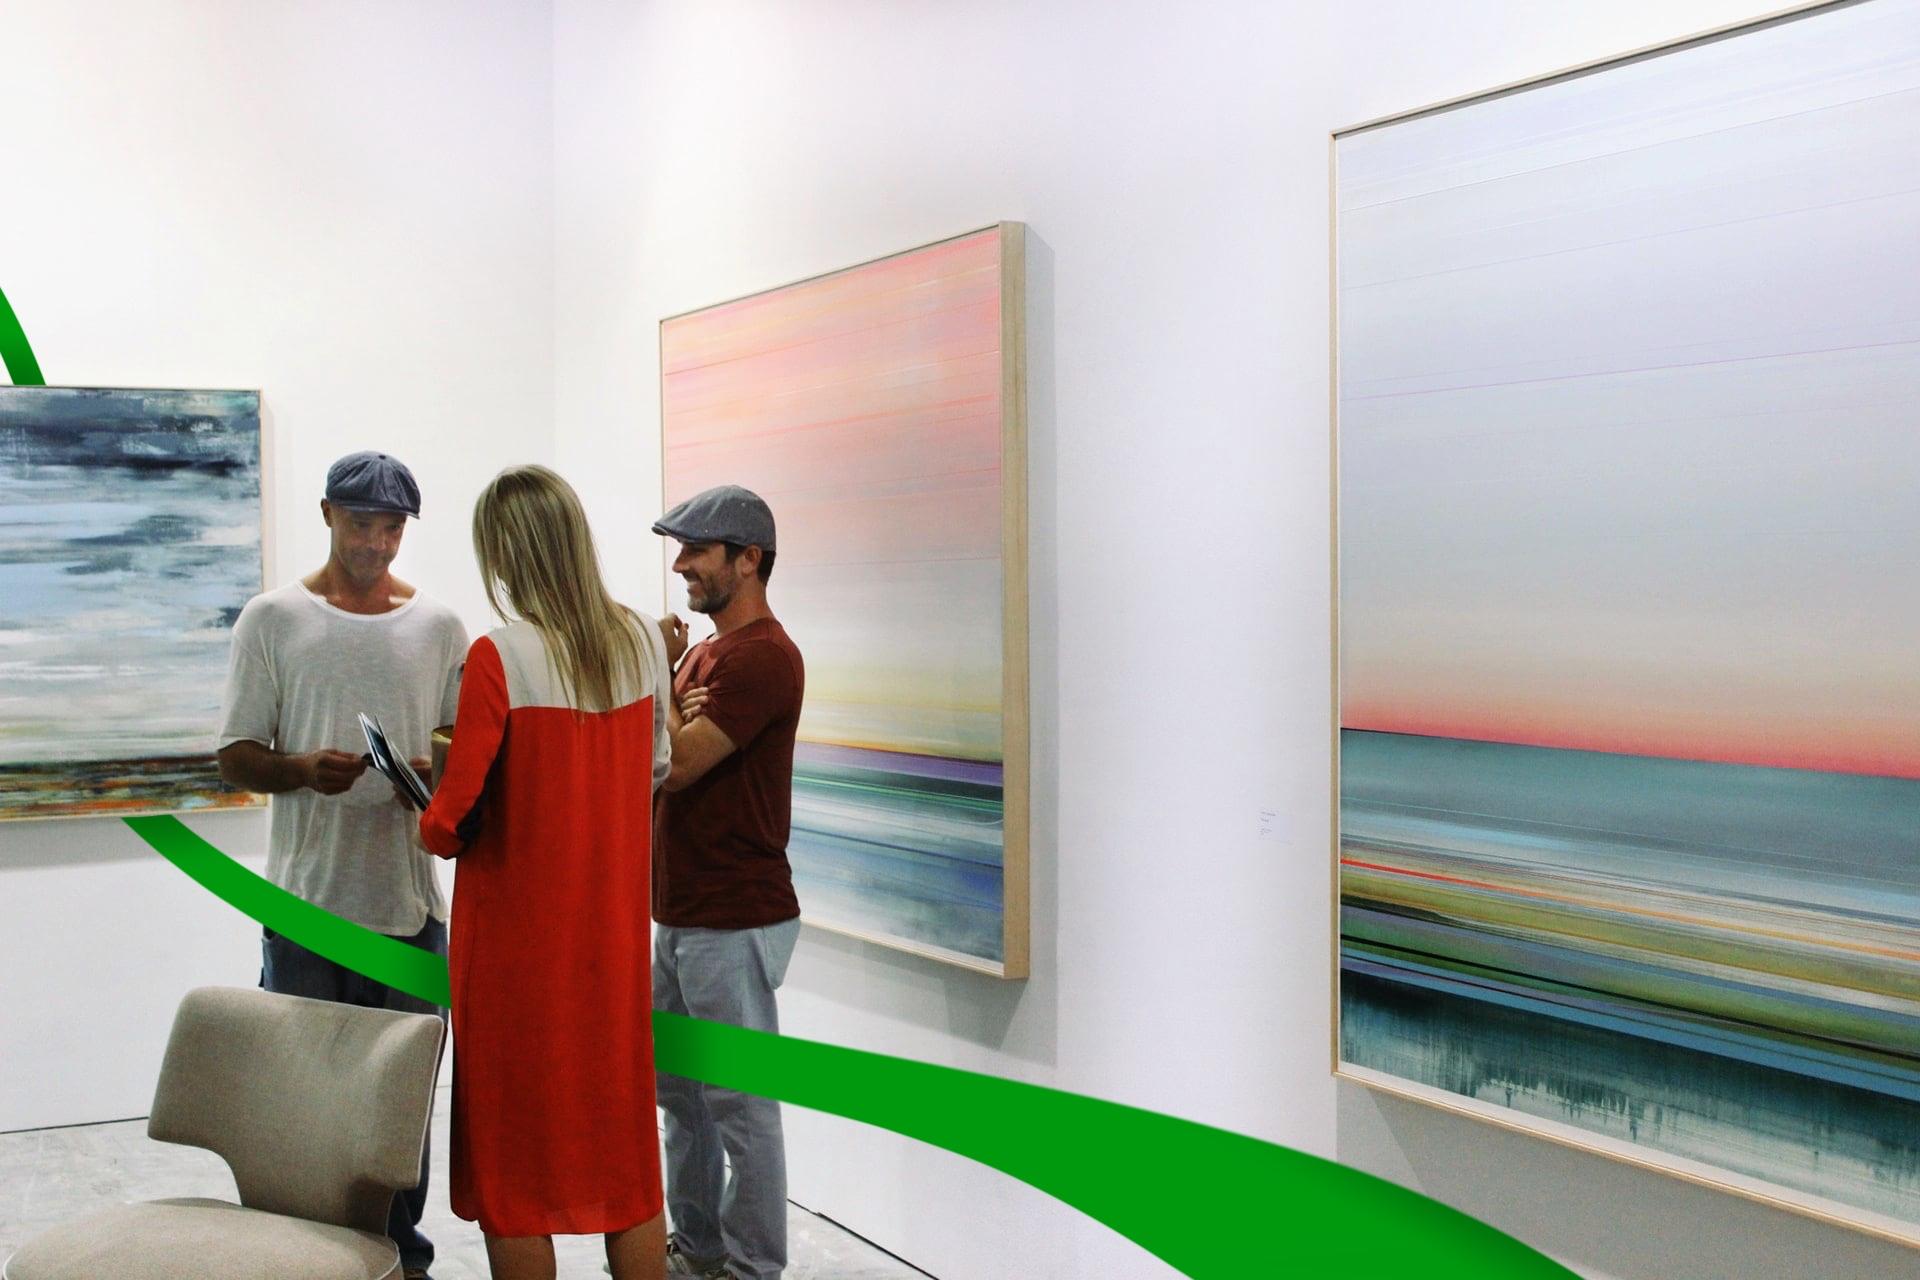 Conversation in an art gallery